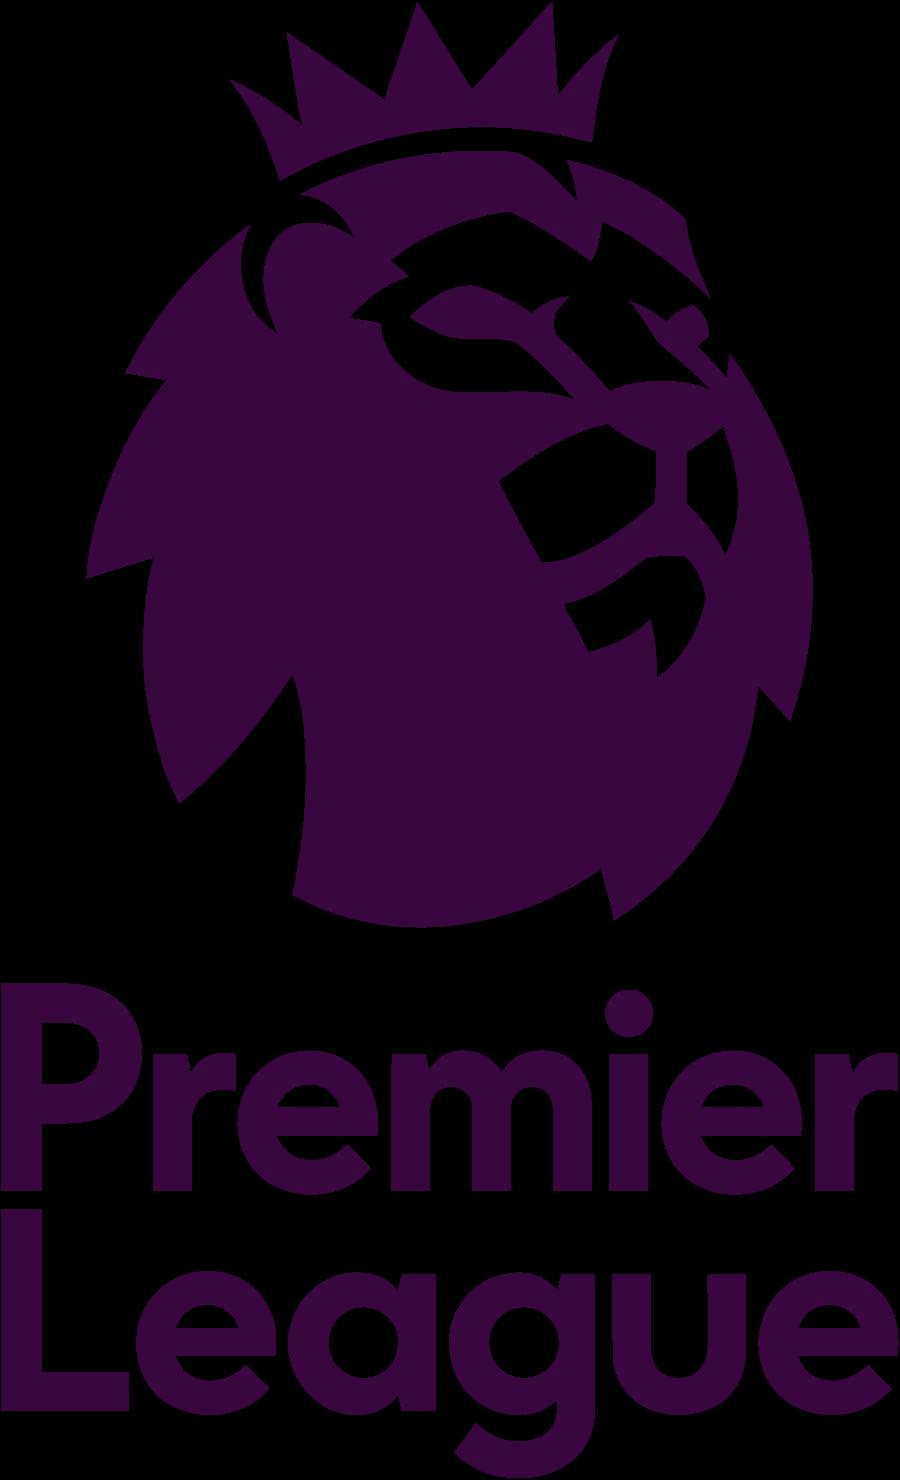 premier league logo fifplay premier league logo fifplay